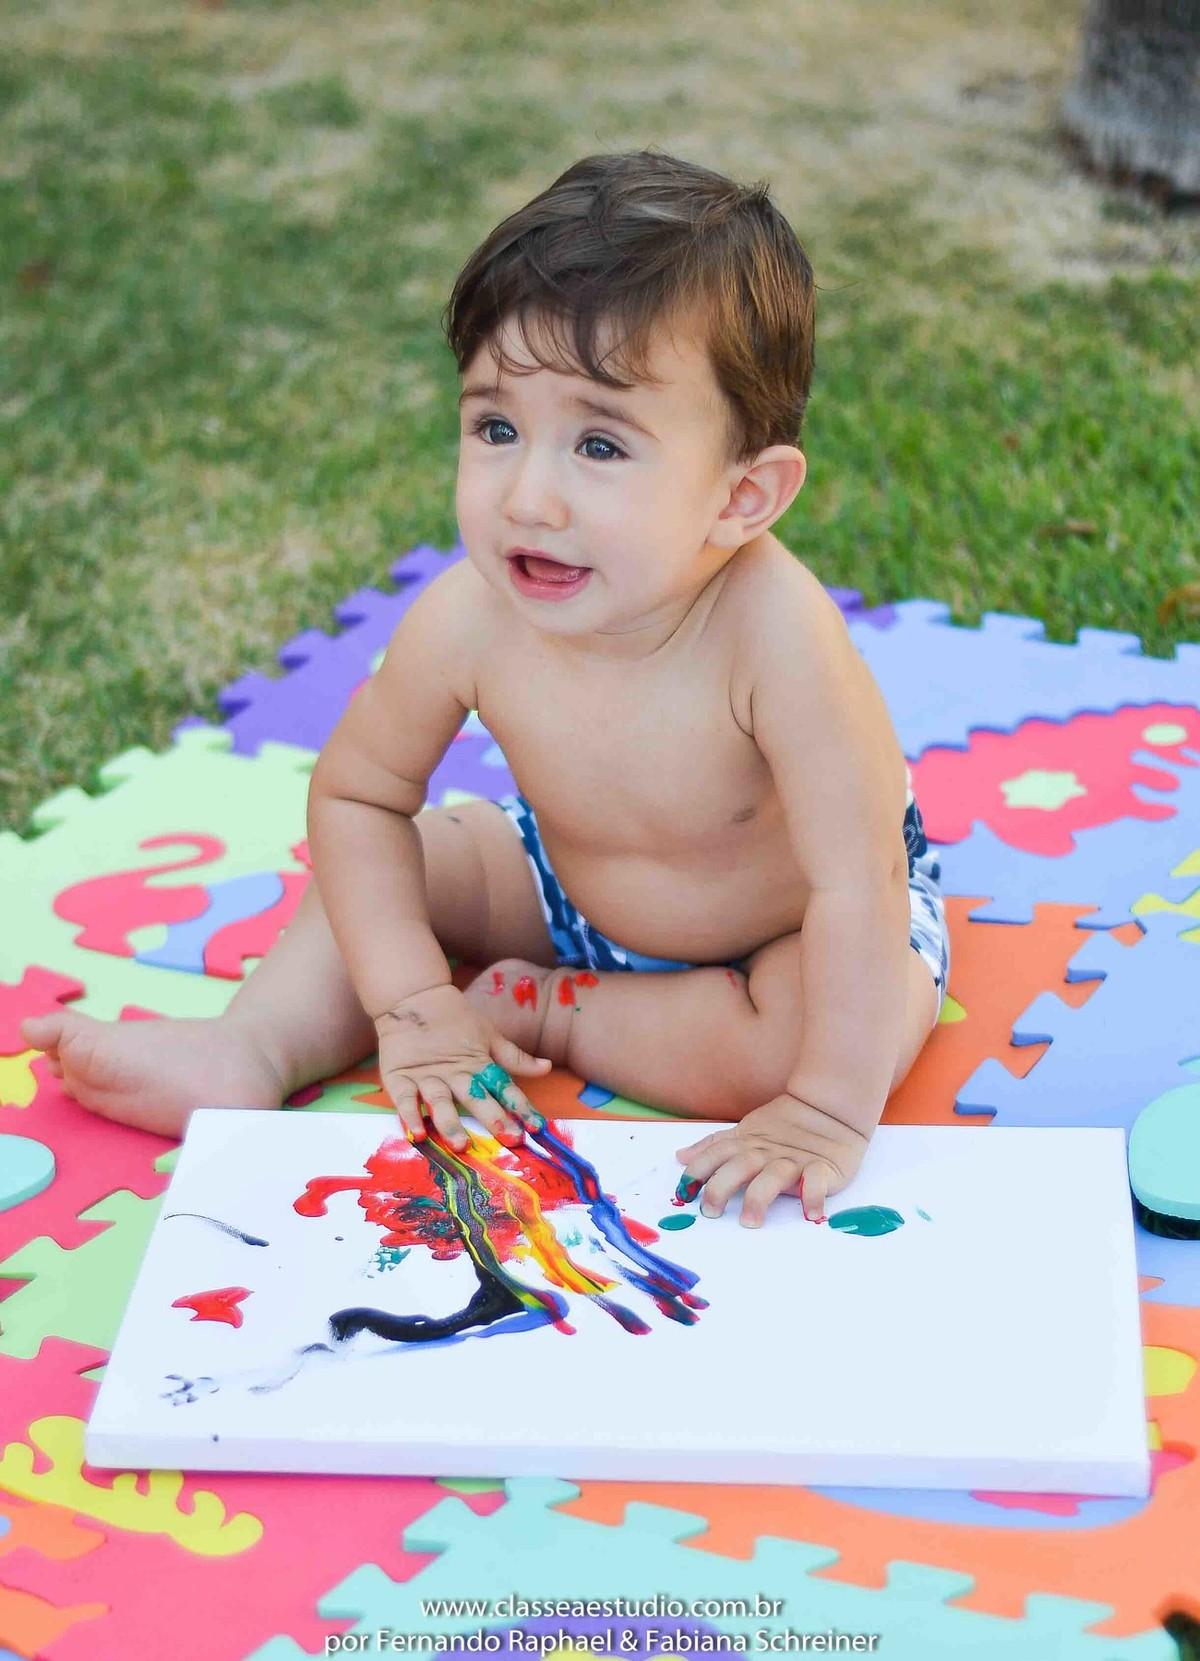 Fotos de bebe em estudio